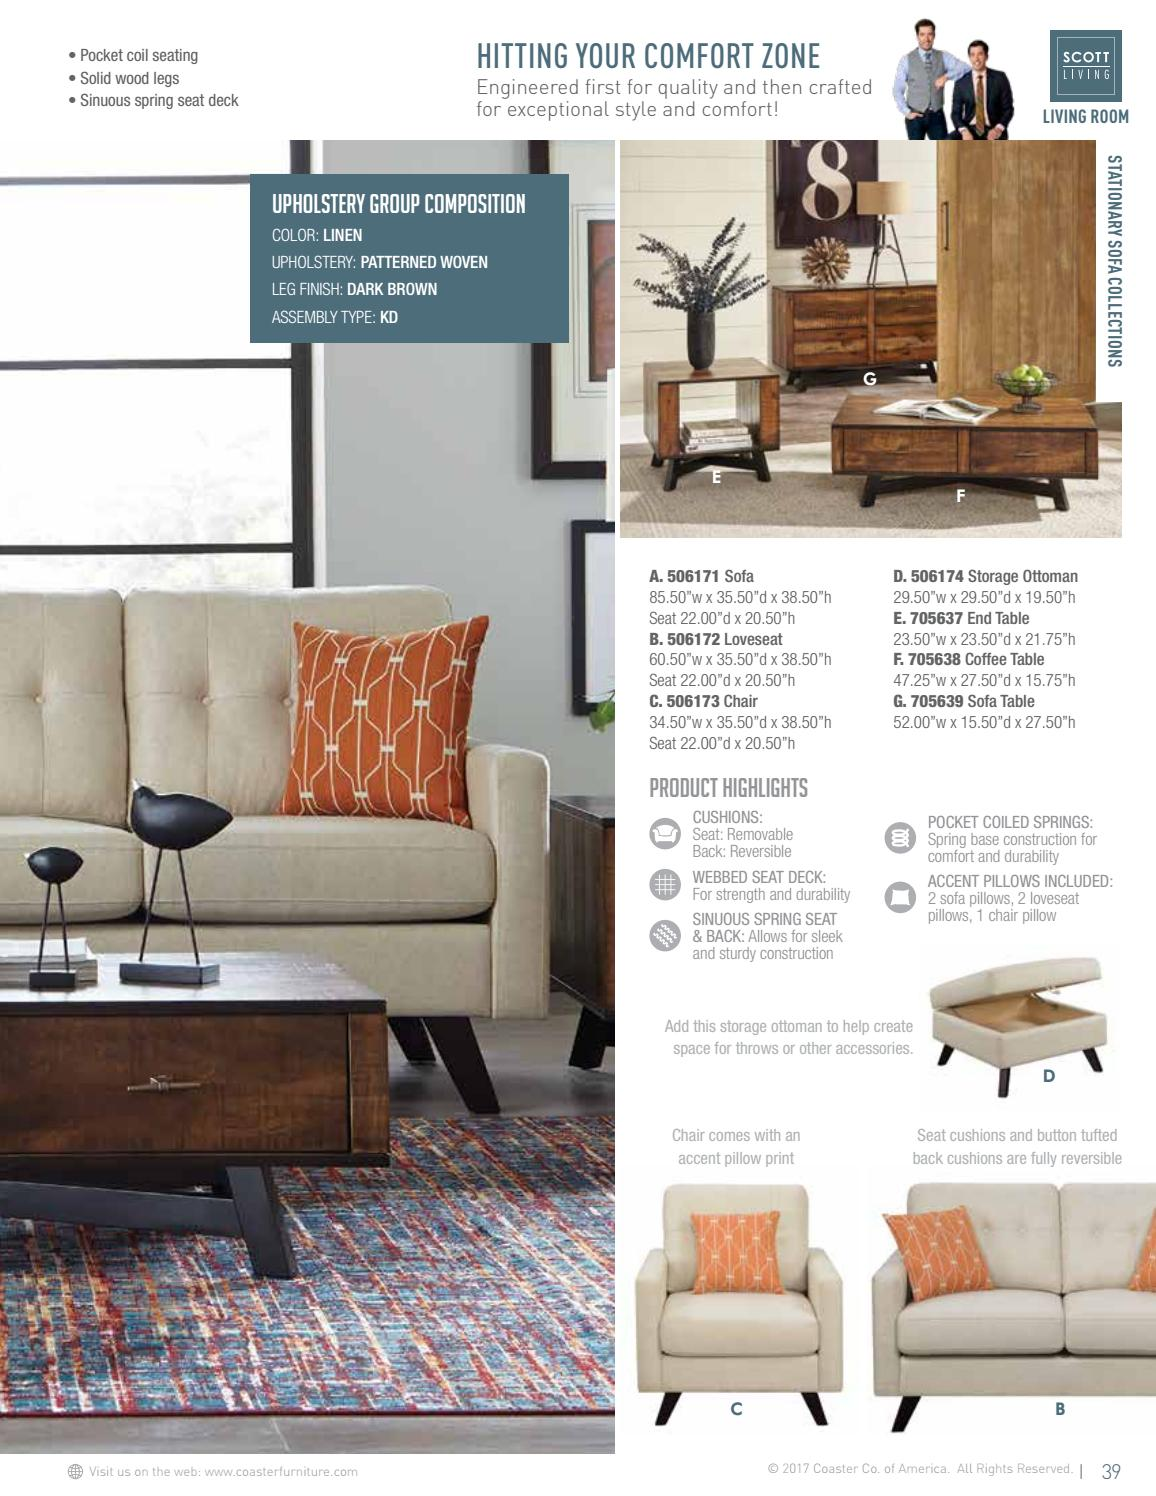 Phenomenal 2018 Scott Living Catalog By Home Design 2018 Issuu Dailytribune Chair Design For Home Dailytribuneorg